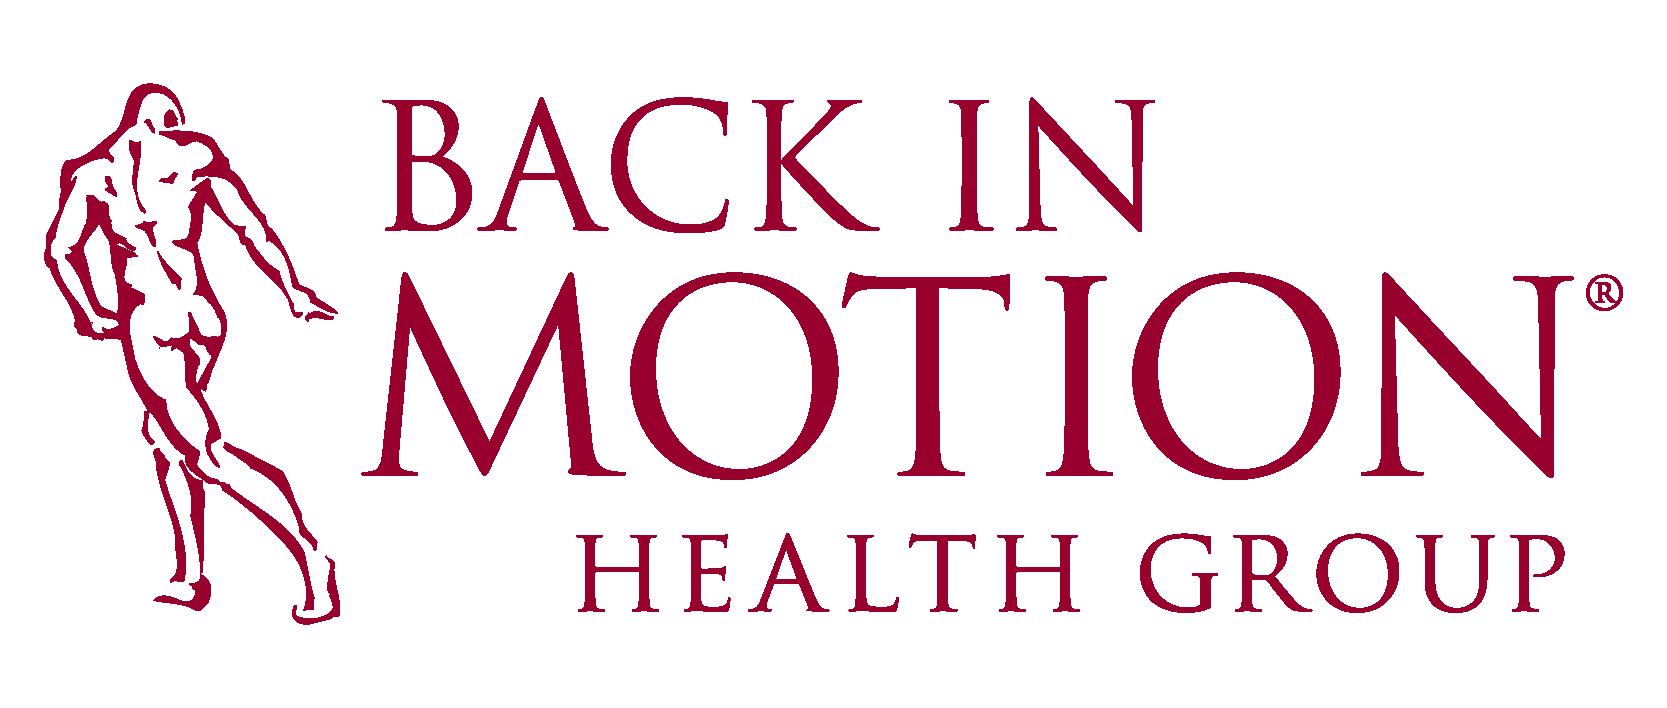 Back In Motion Health Group Logo